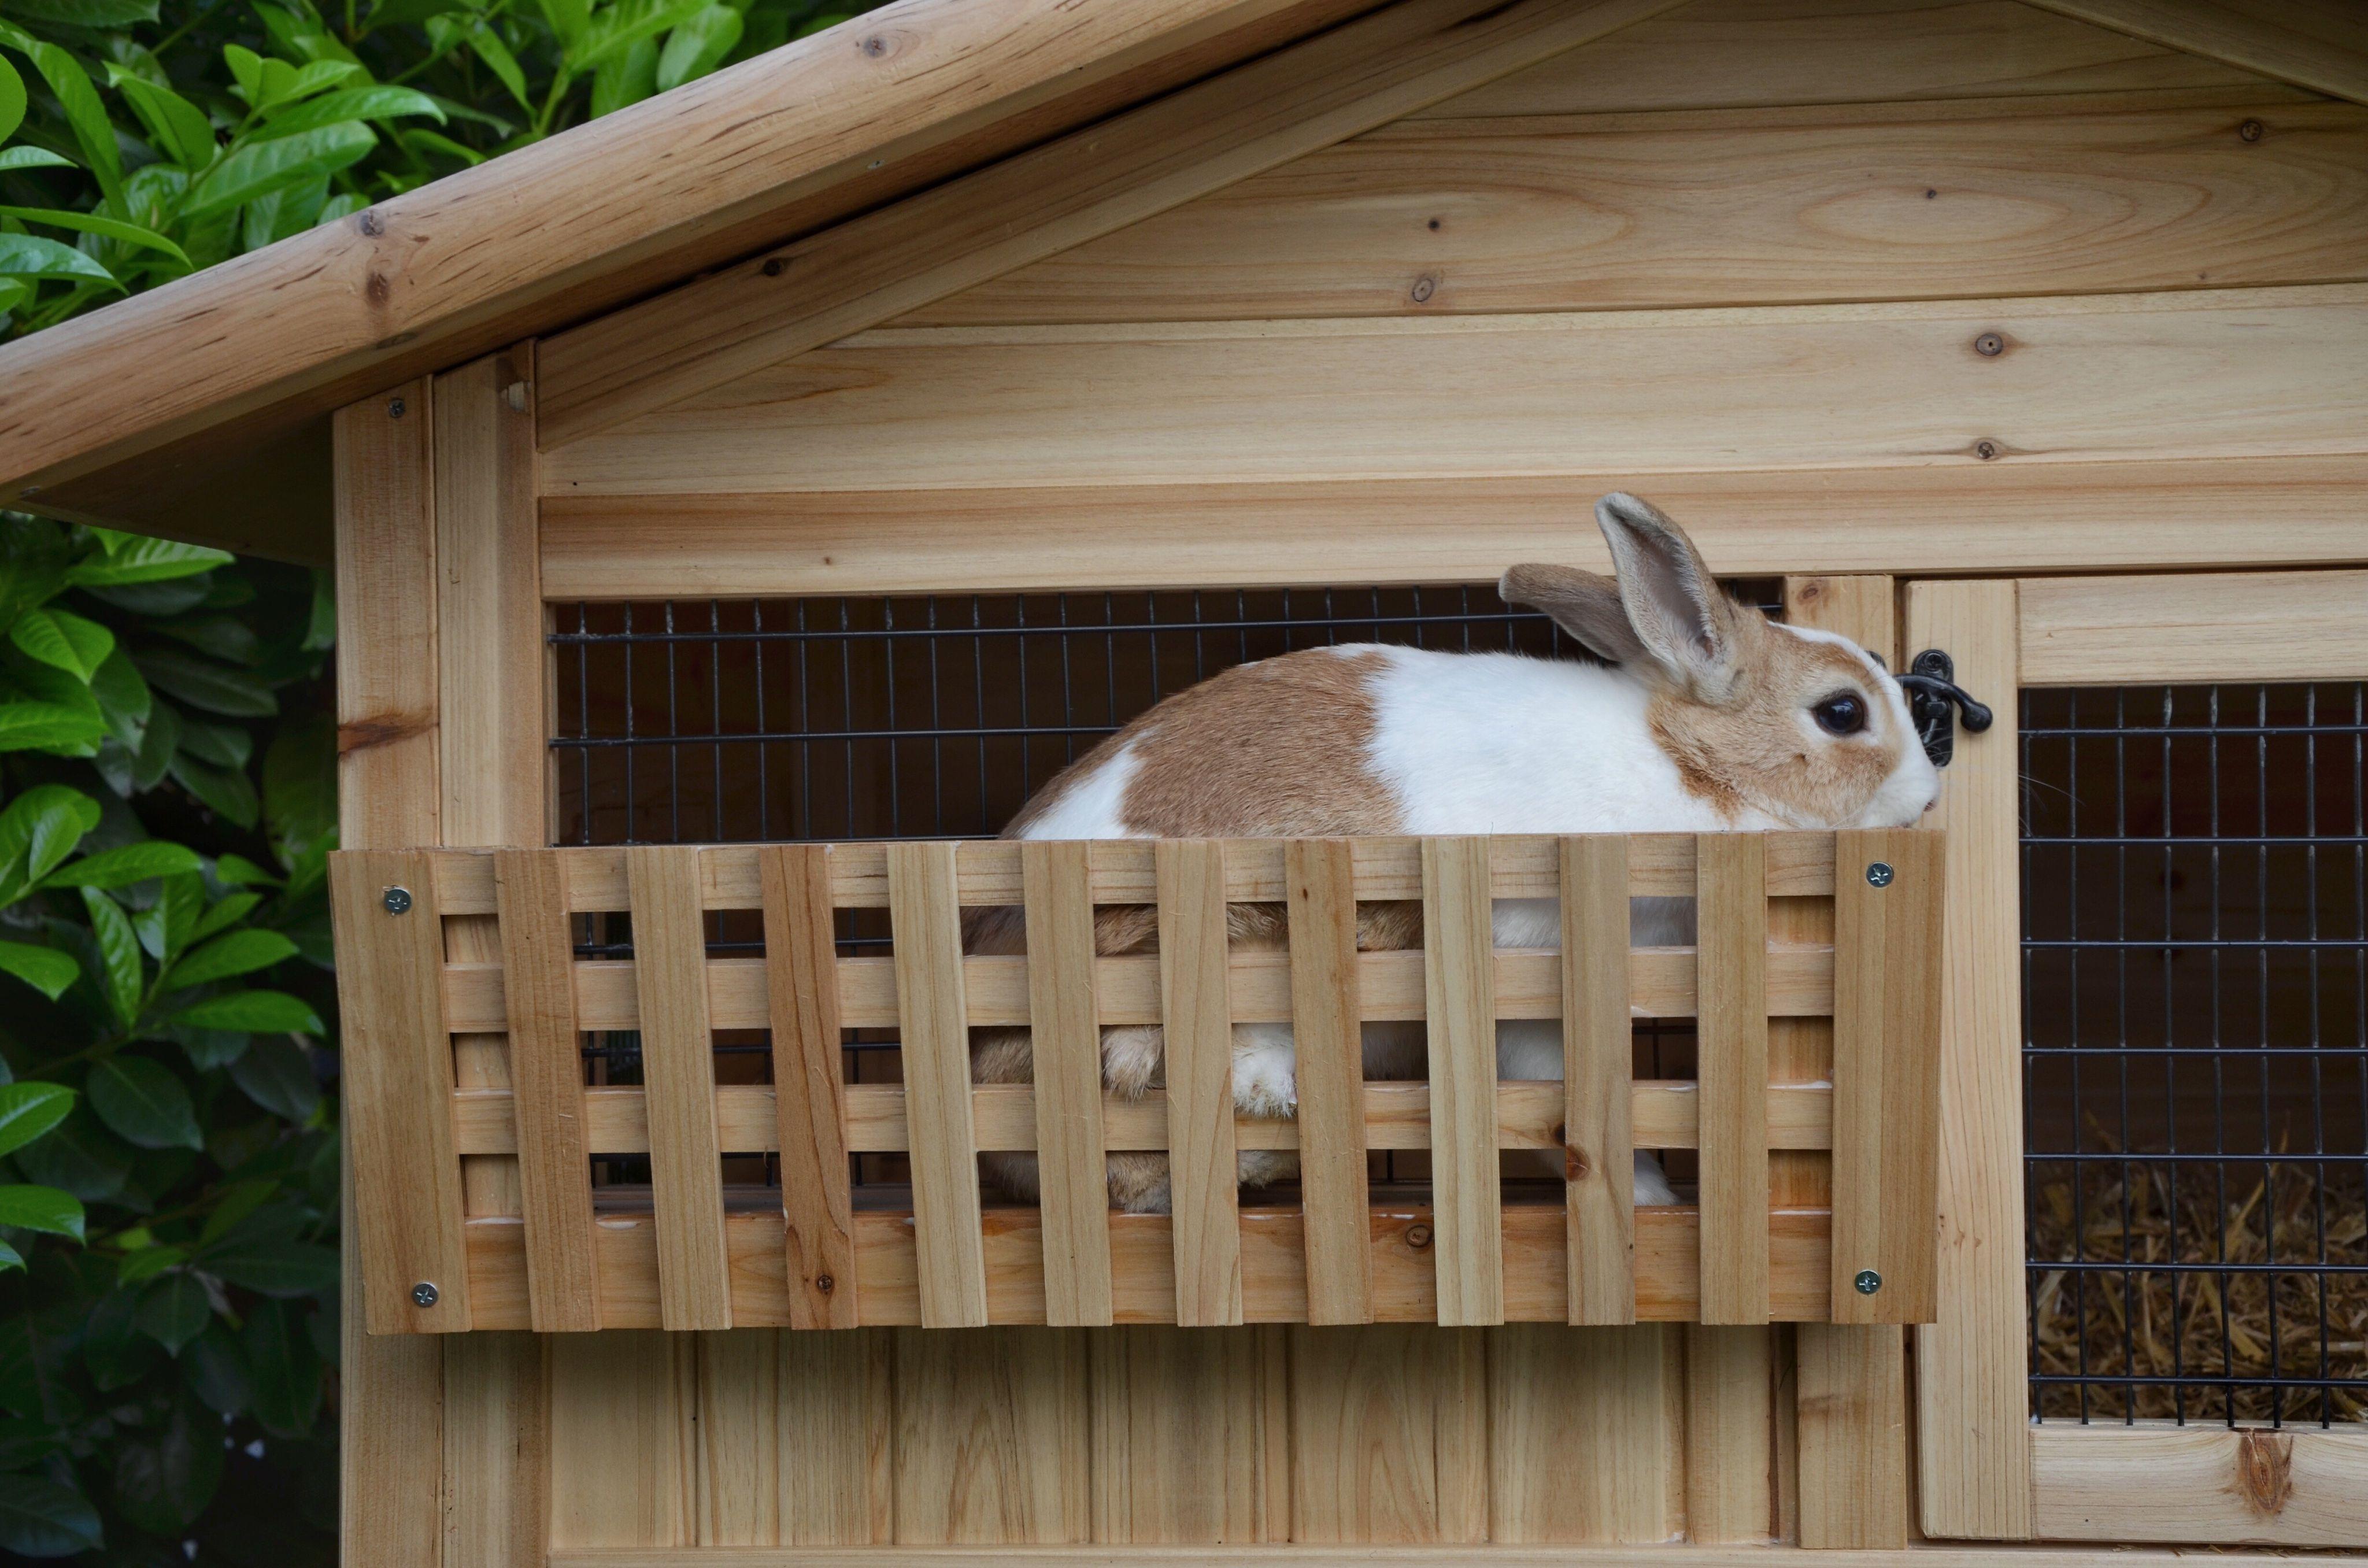 Rabbit in hutch